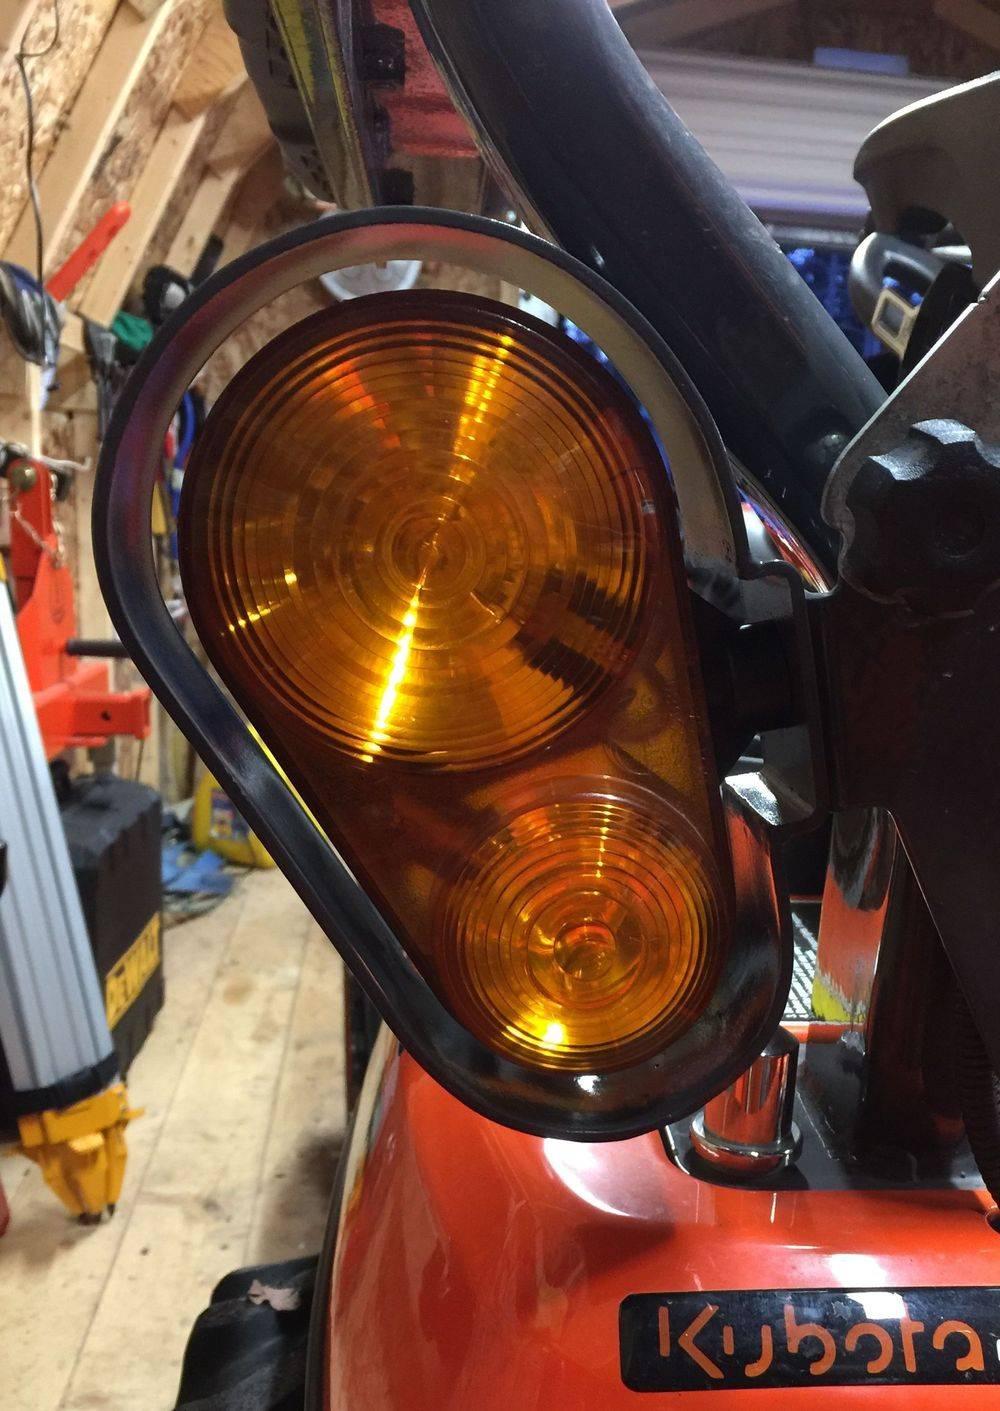 Kubota tractor light guards. BX light guards